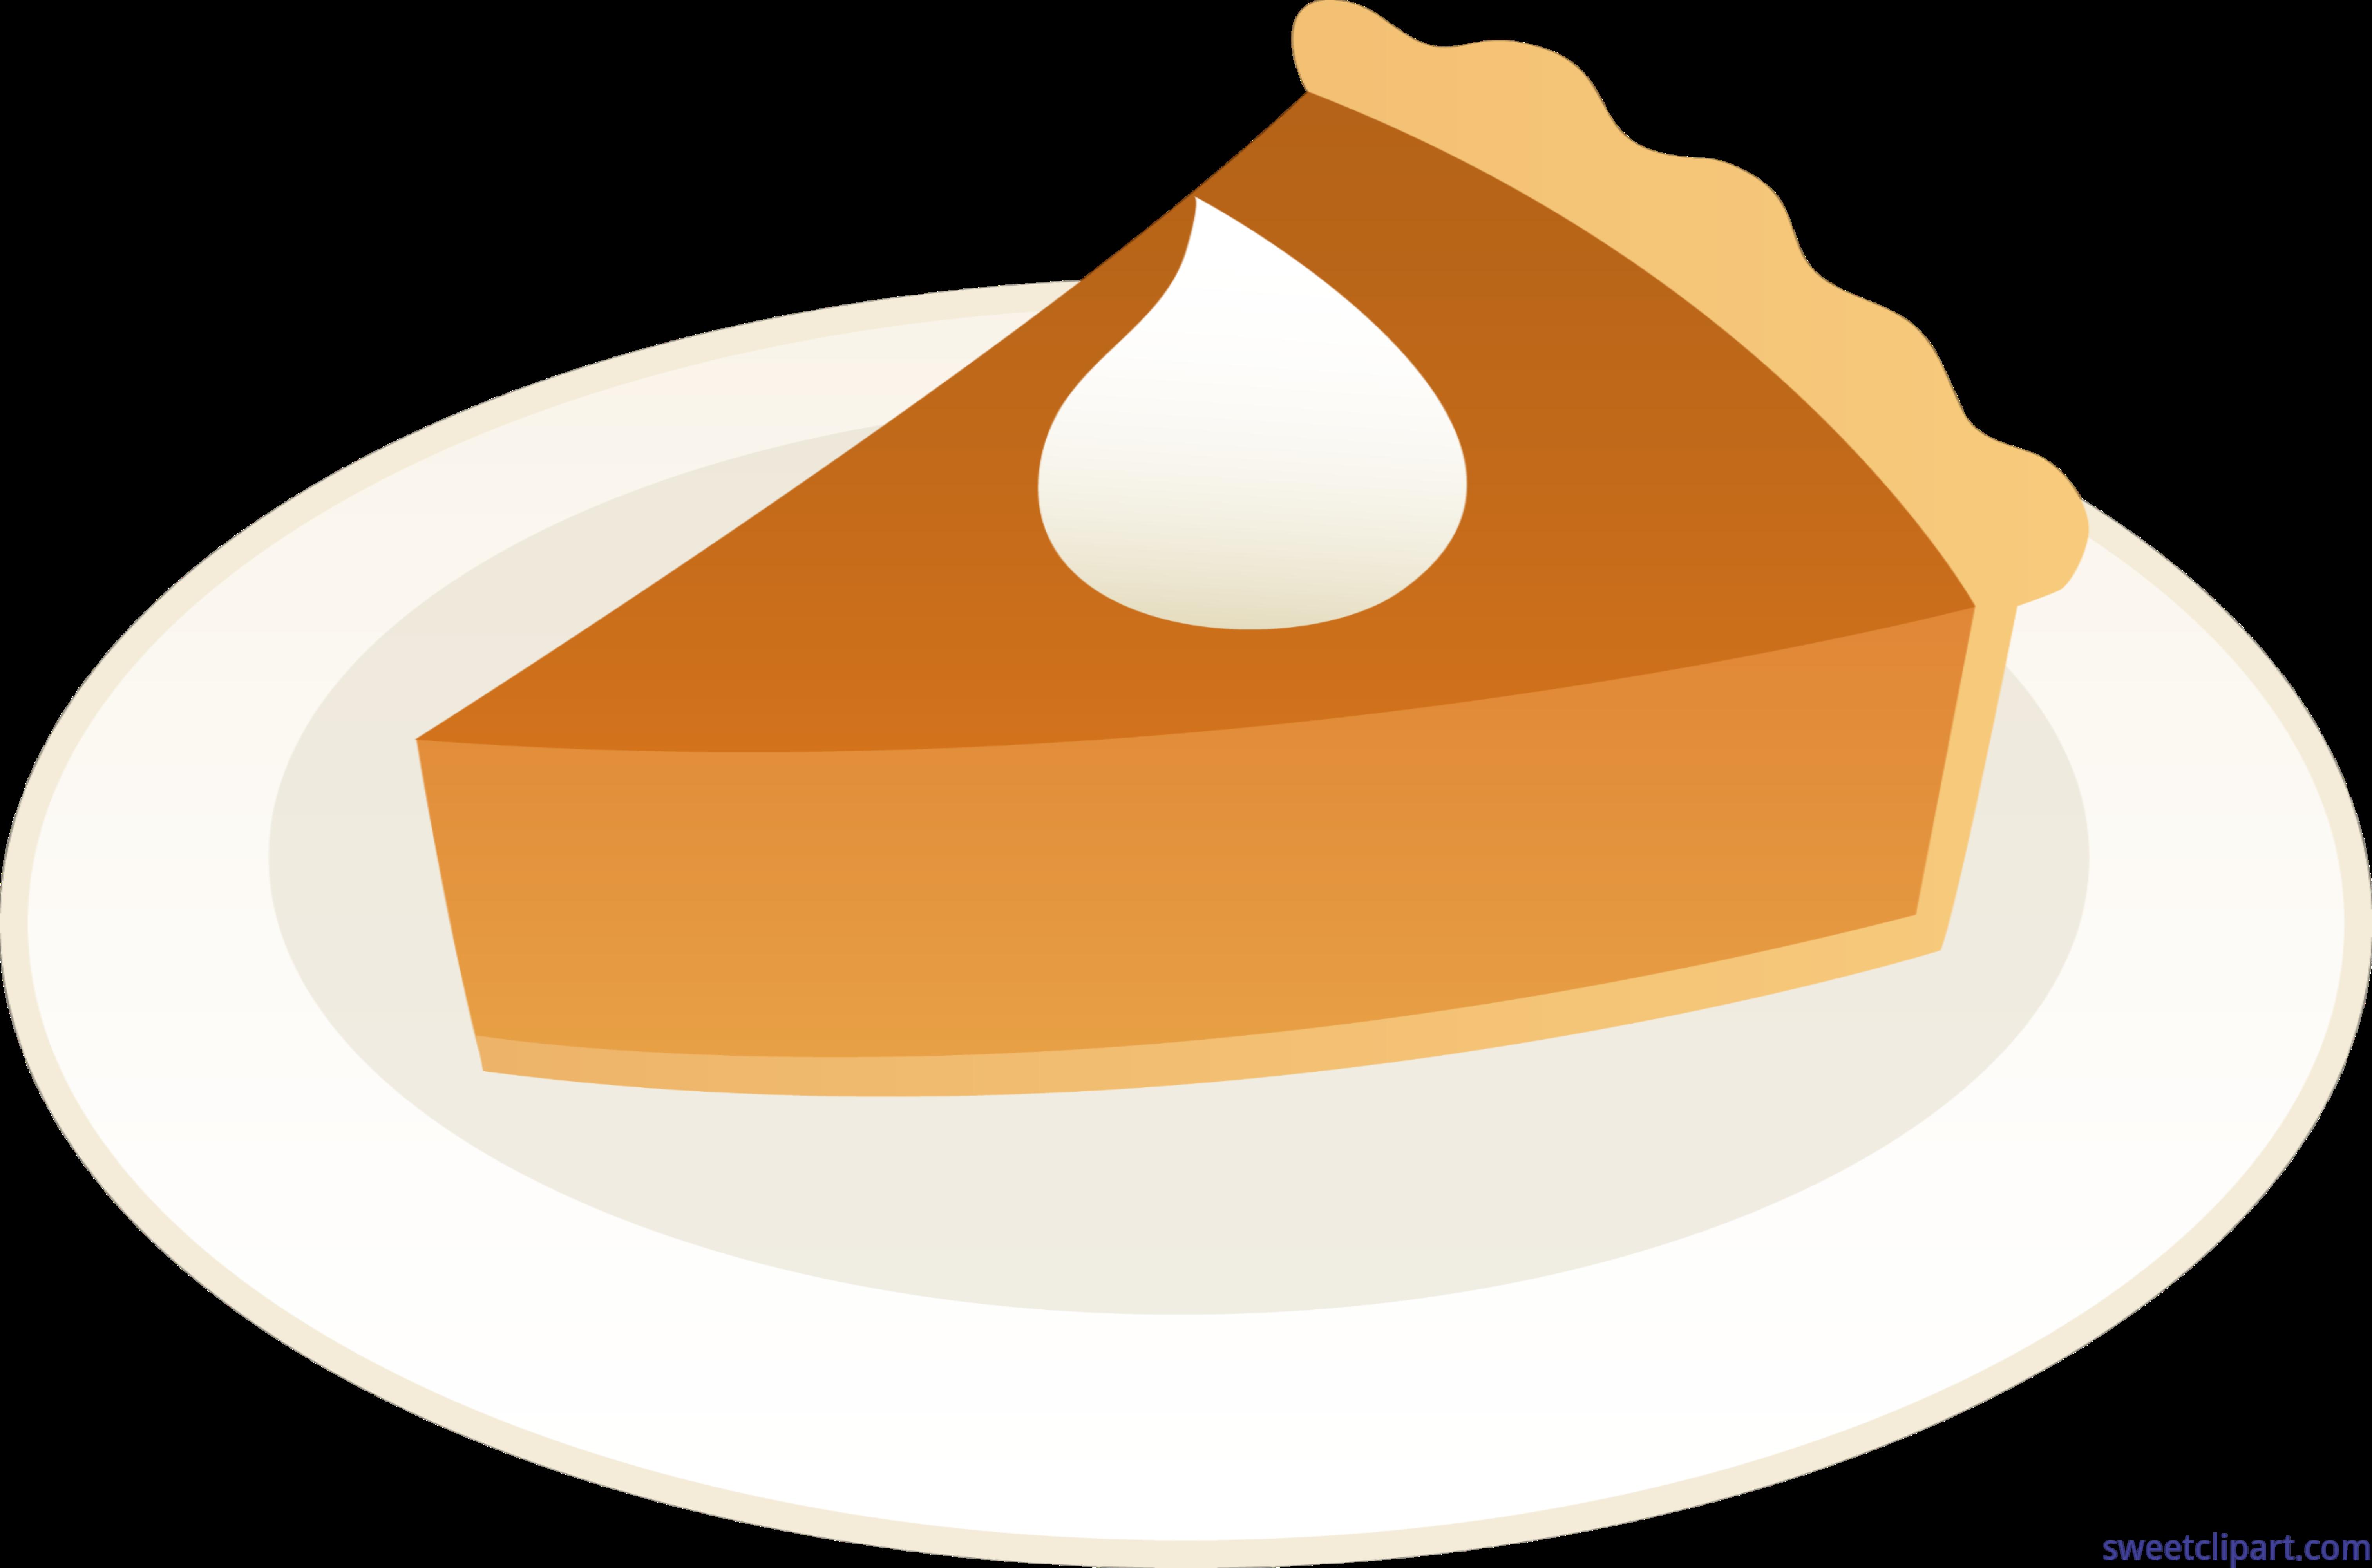 Desserts clipart pumpkin pie. Slice clip art sweet